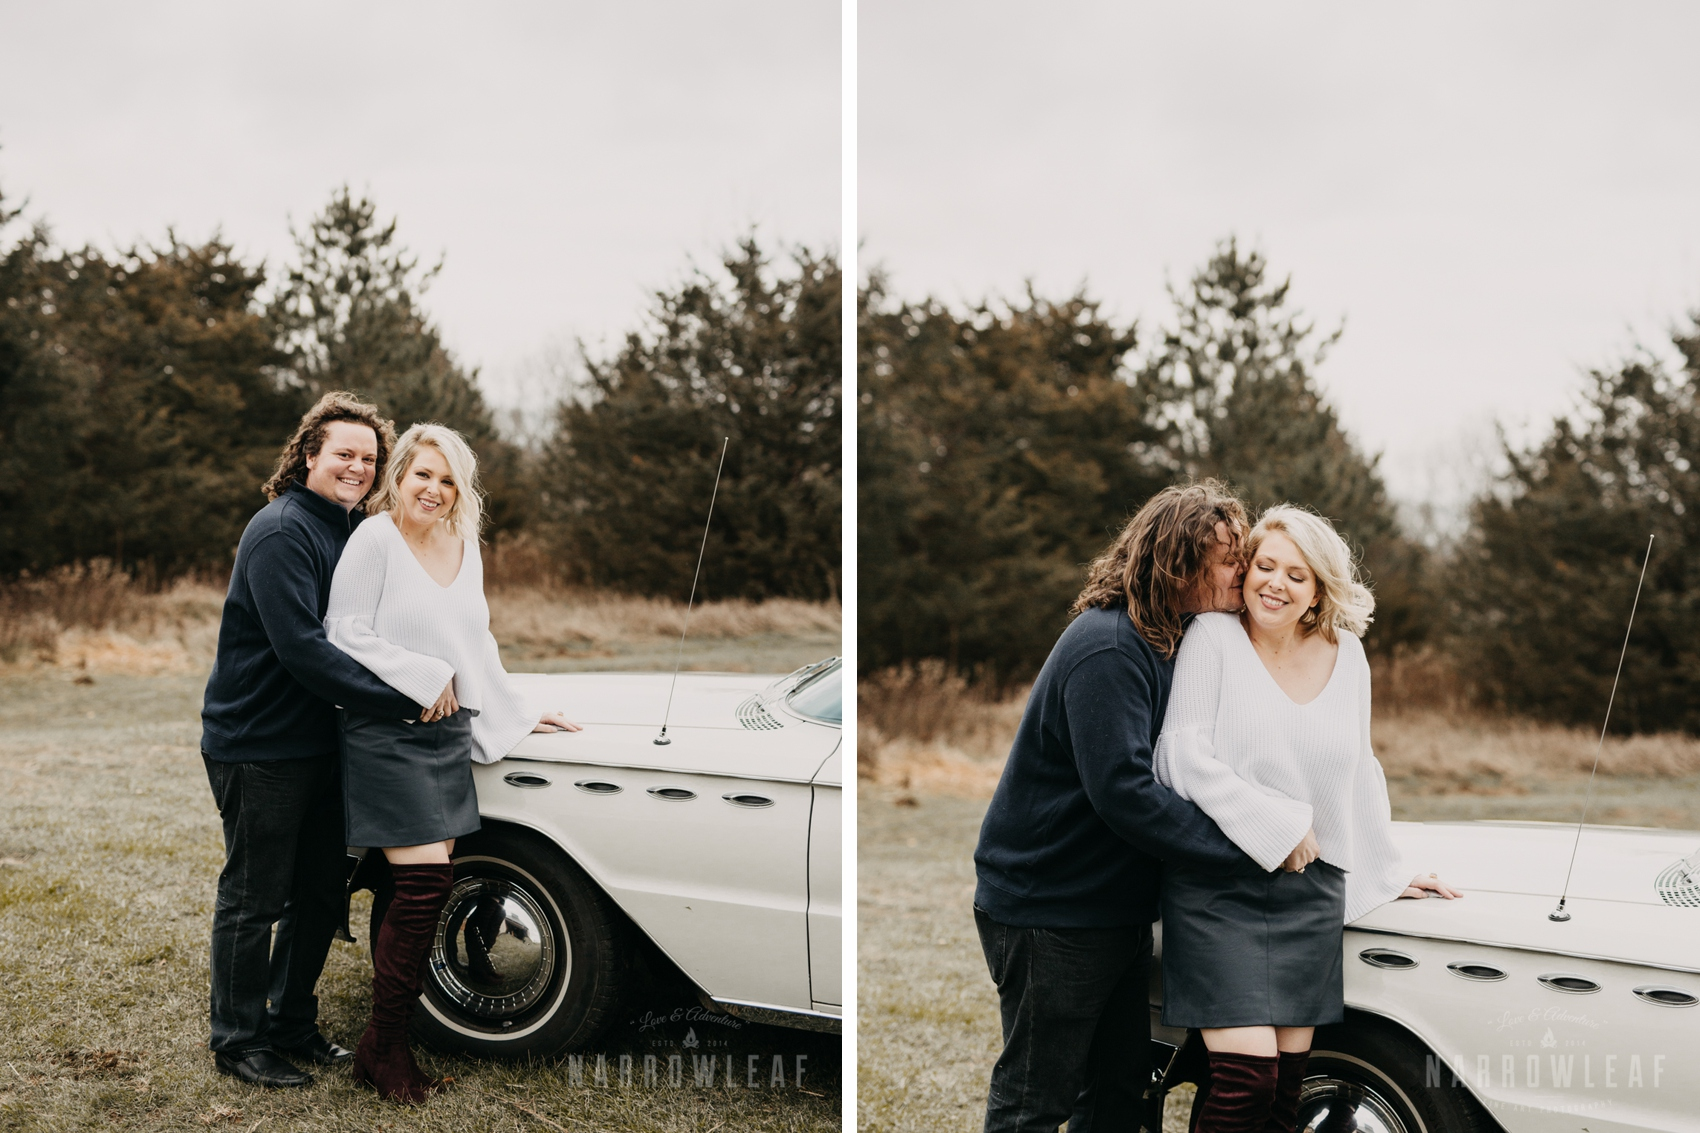 fall-engagement-couple-photos-prescott-wi-narrowleaf-photography-001-002.jpg